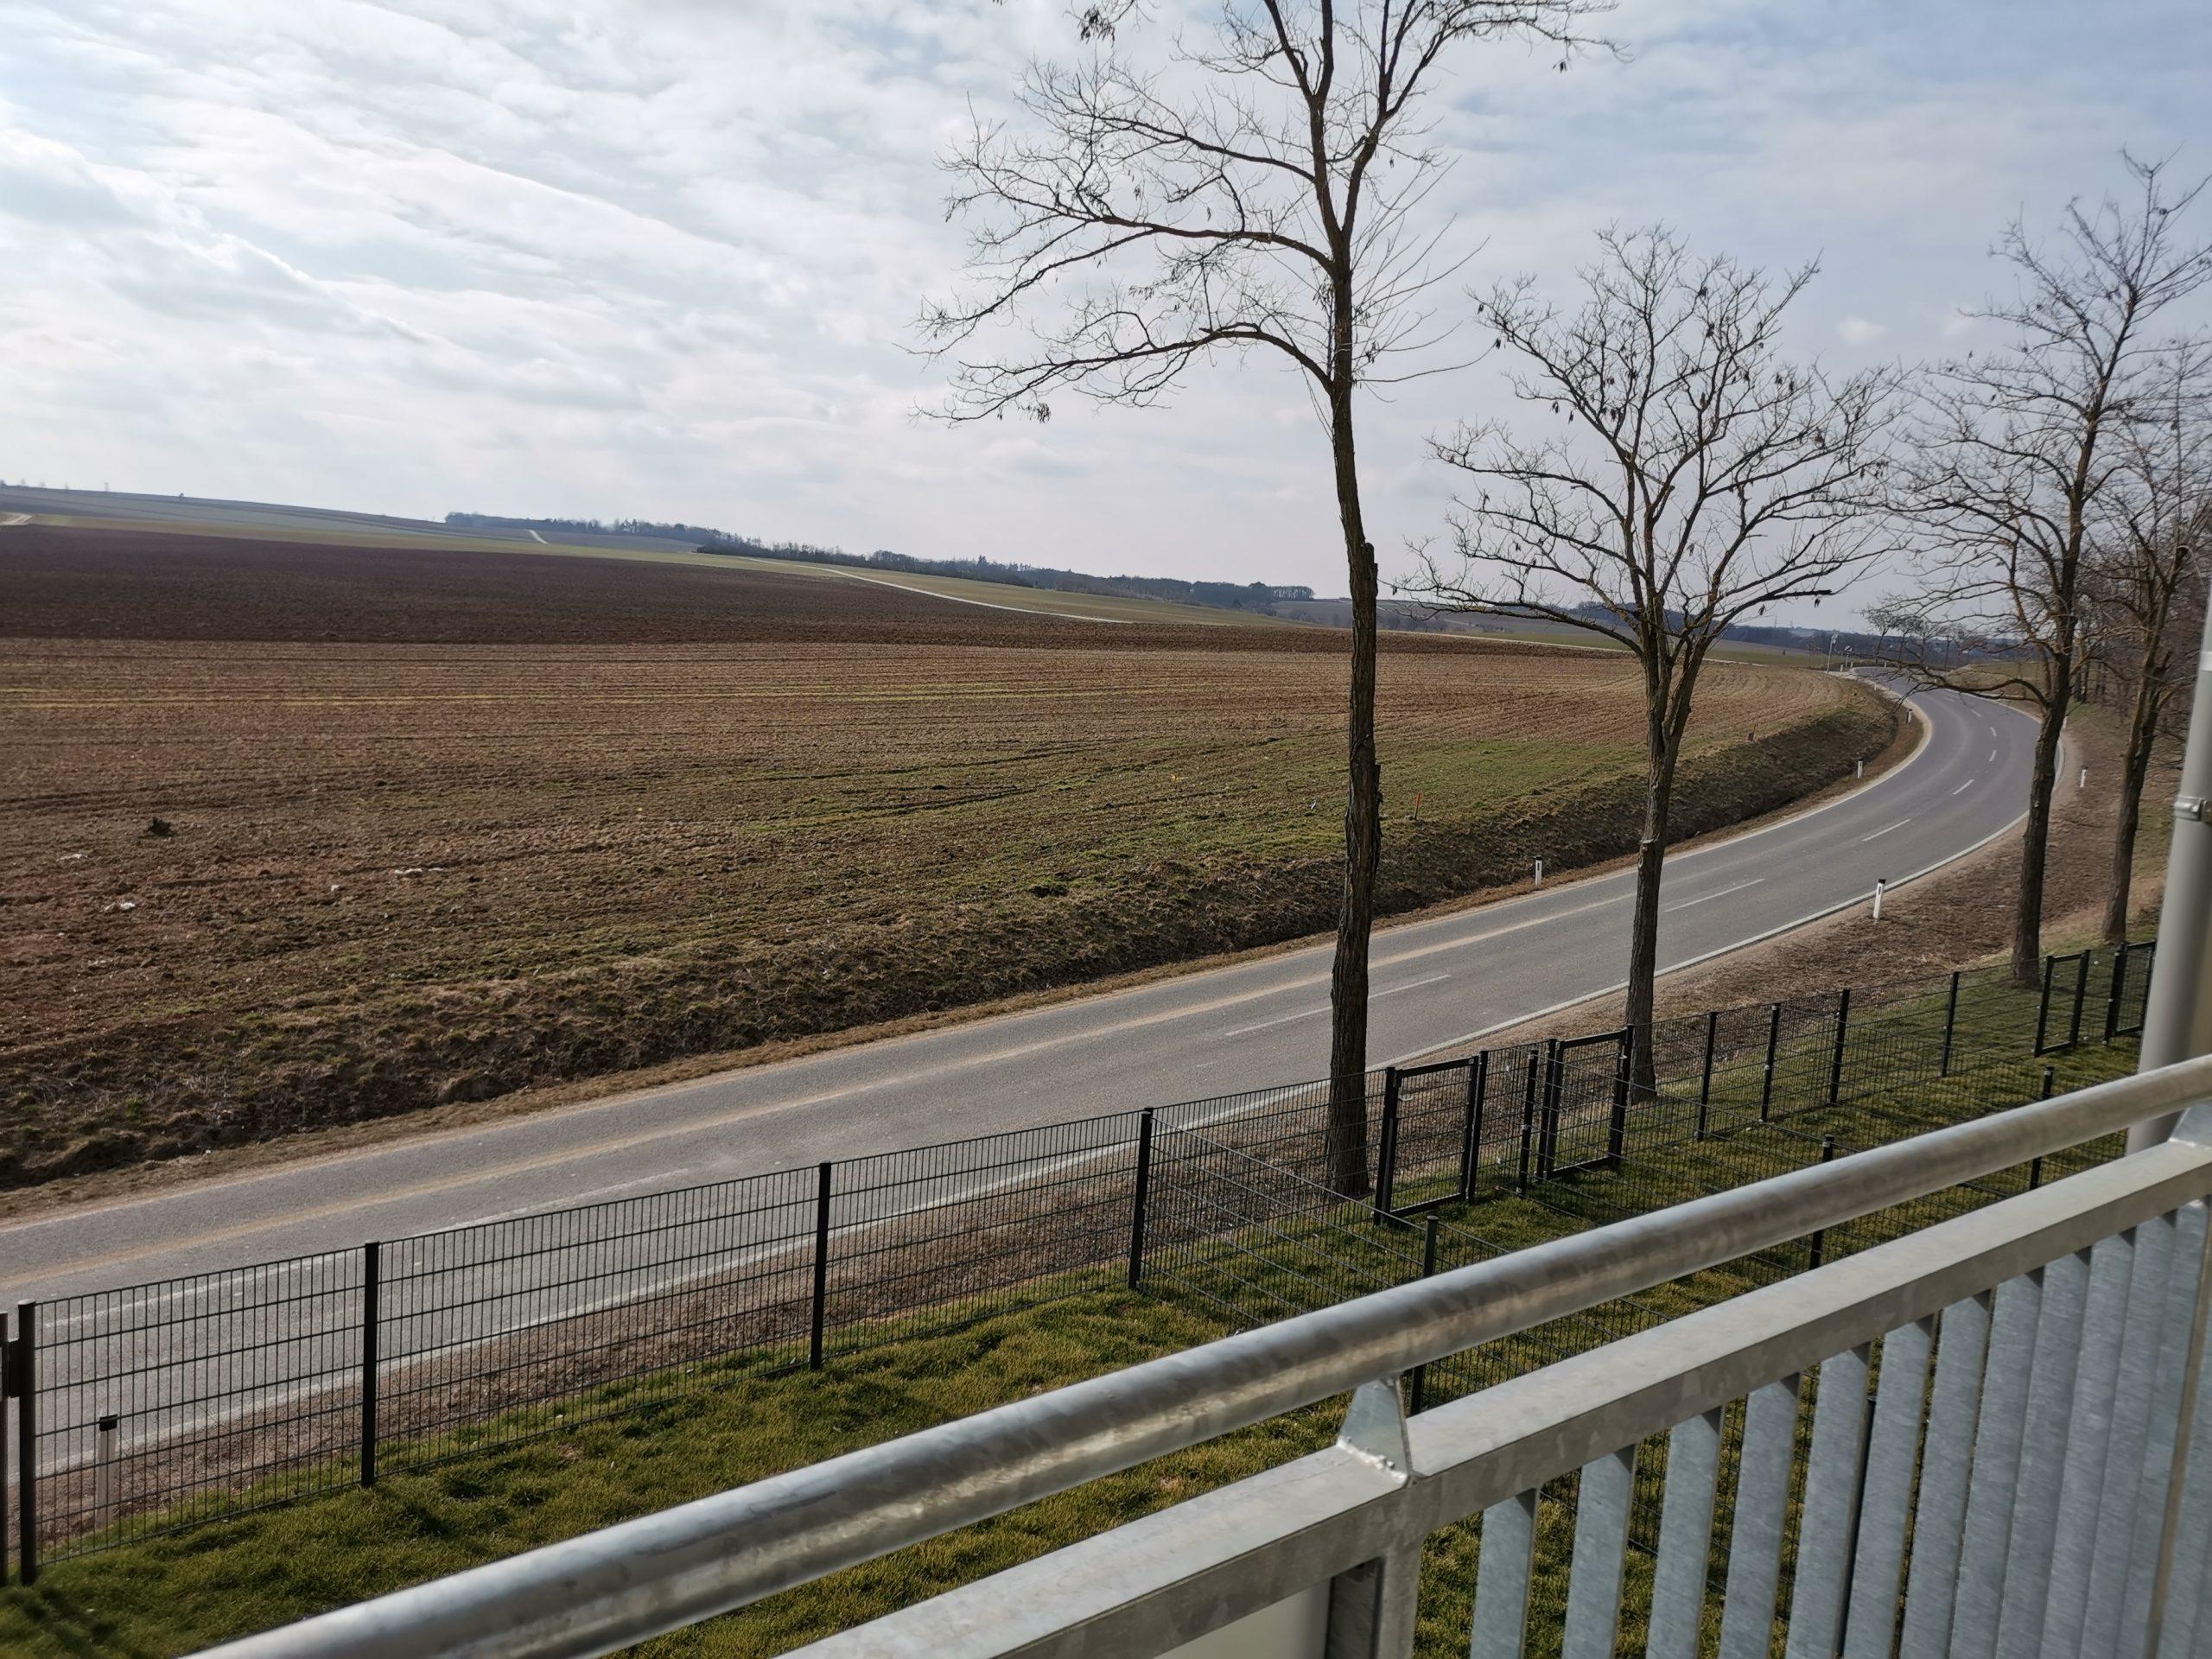 Immobilie von Kamptal in 3730 Eggenburg, Horn, Eggenburg VII - Top 107 #1